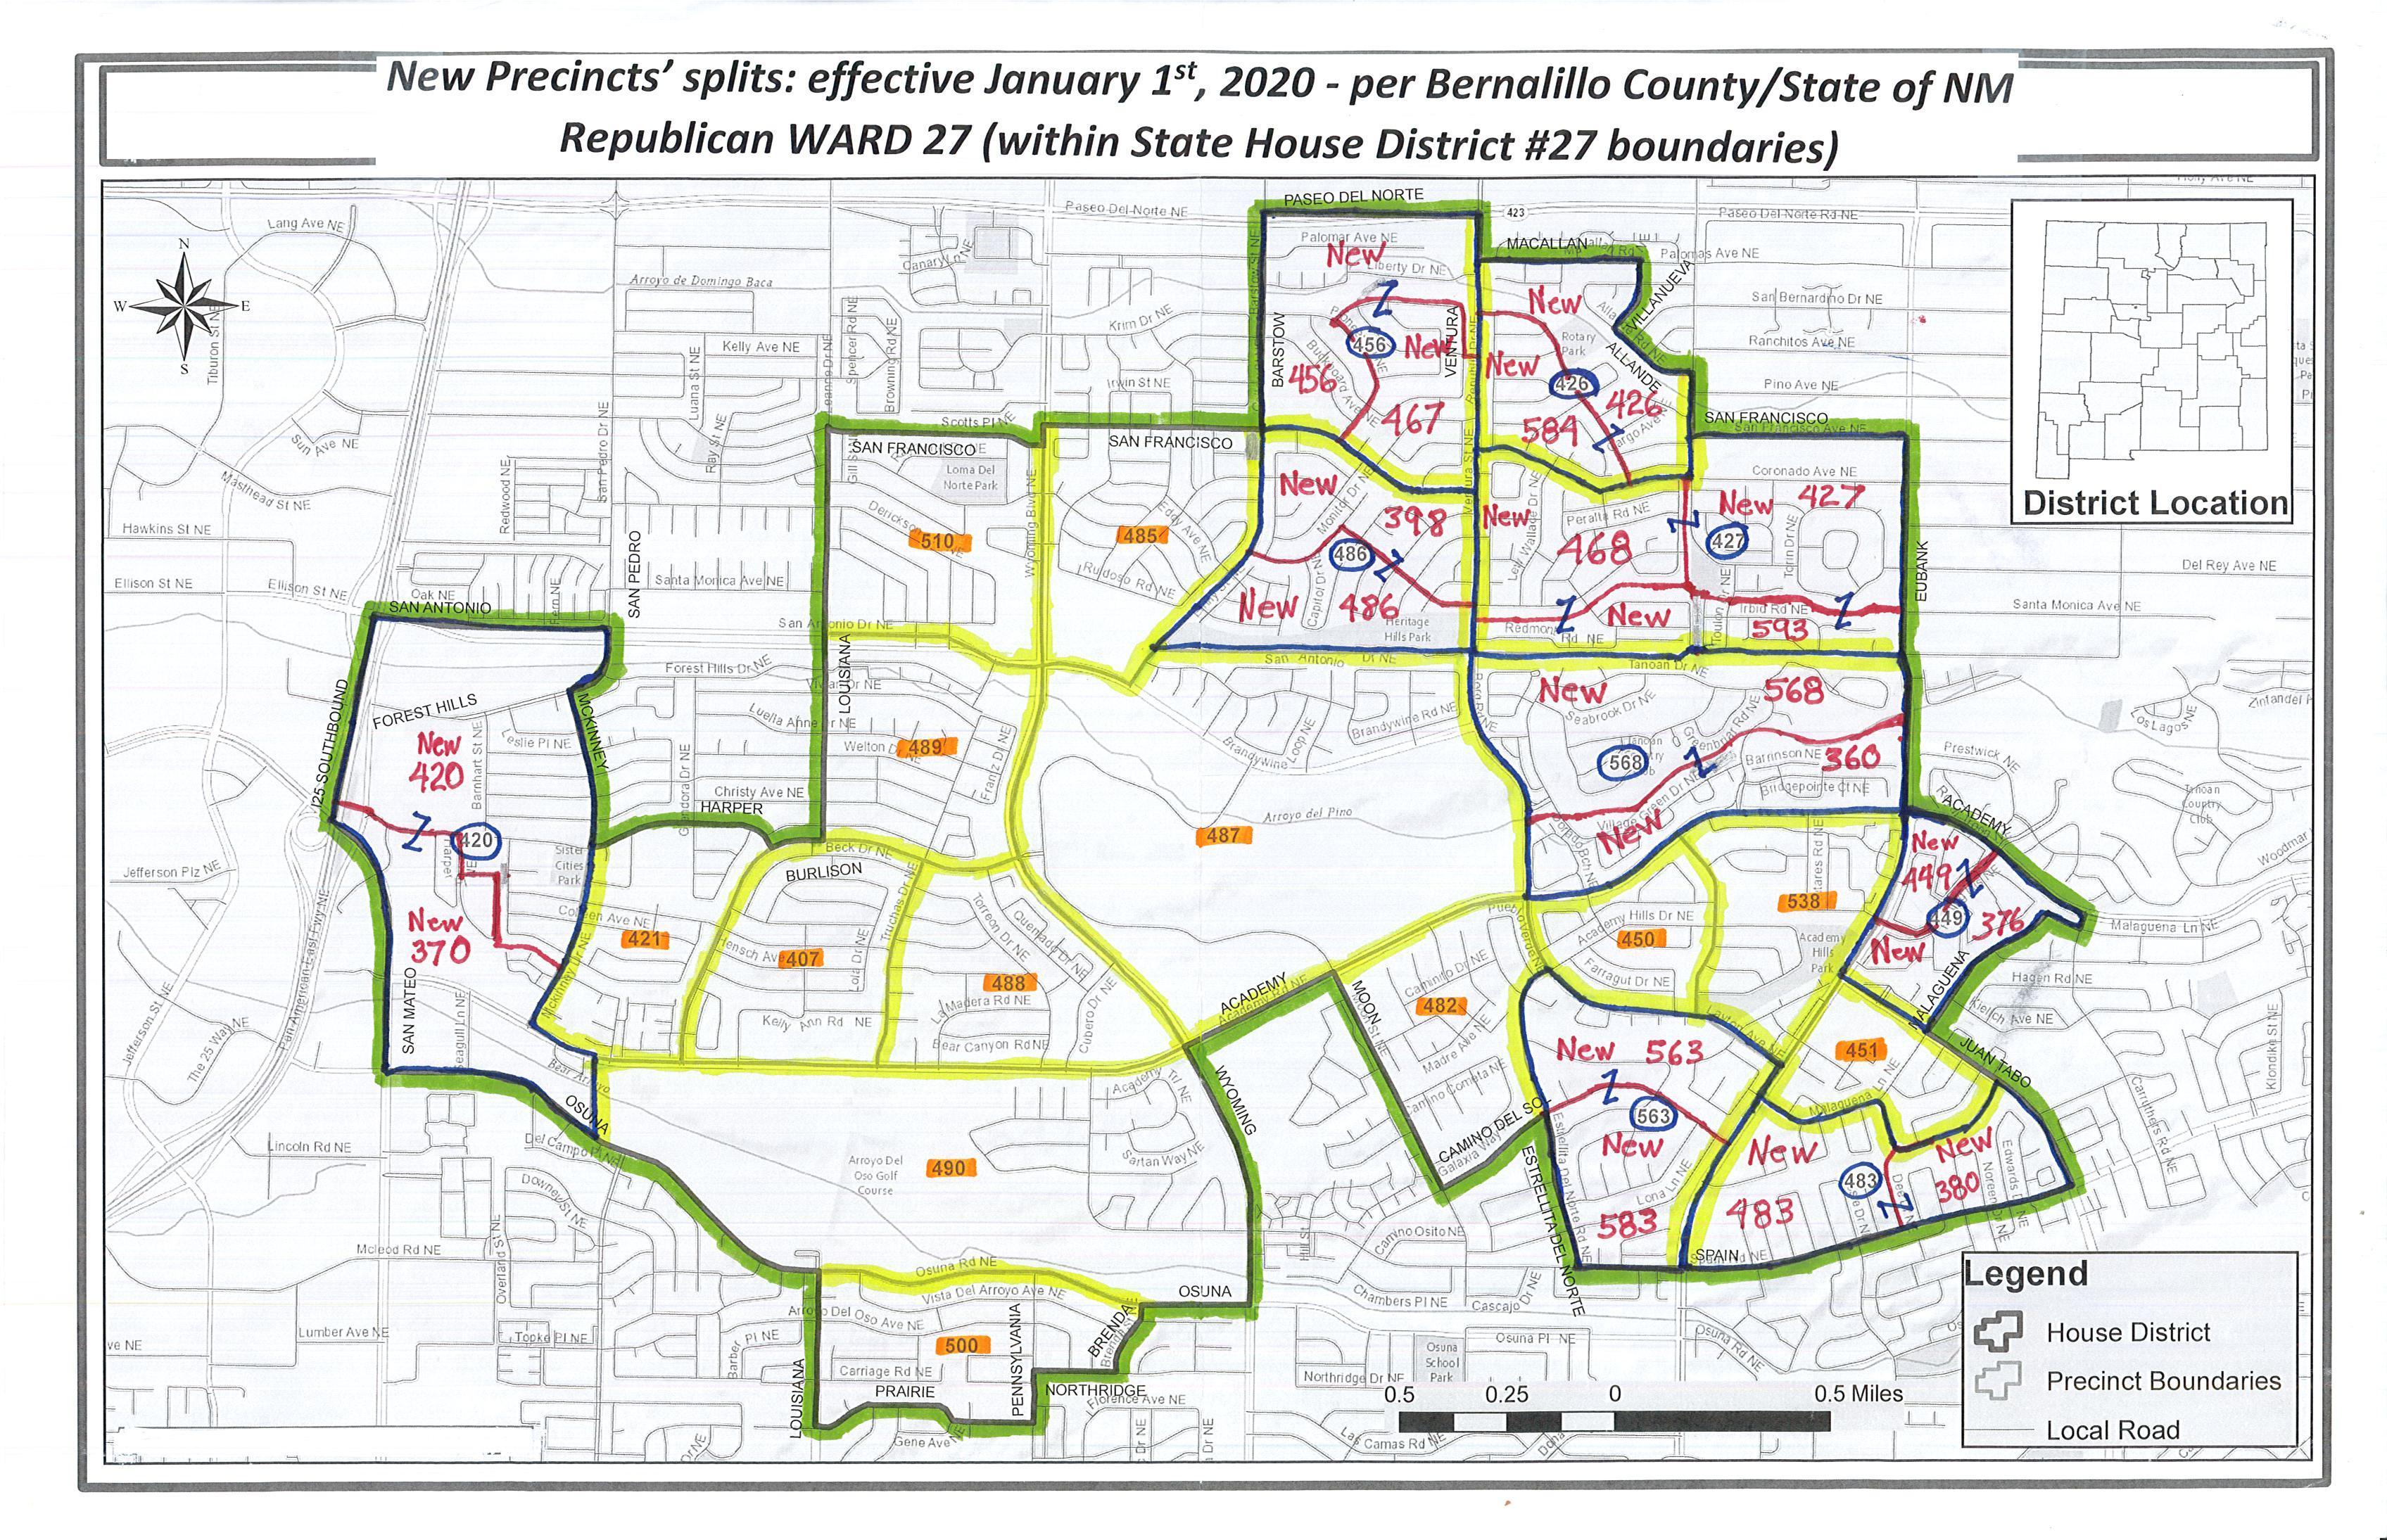 Ward27Precincts'-NewSplits2020